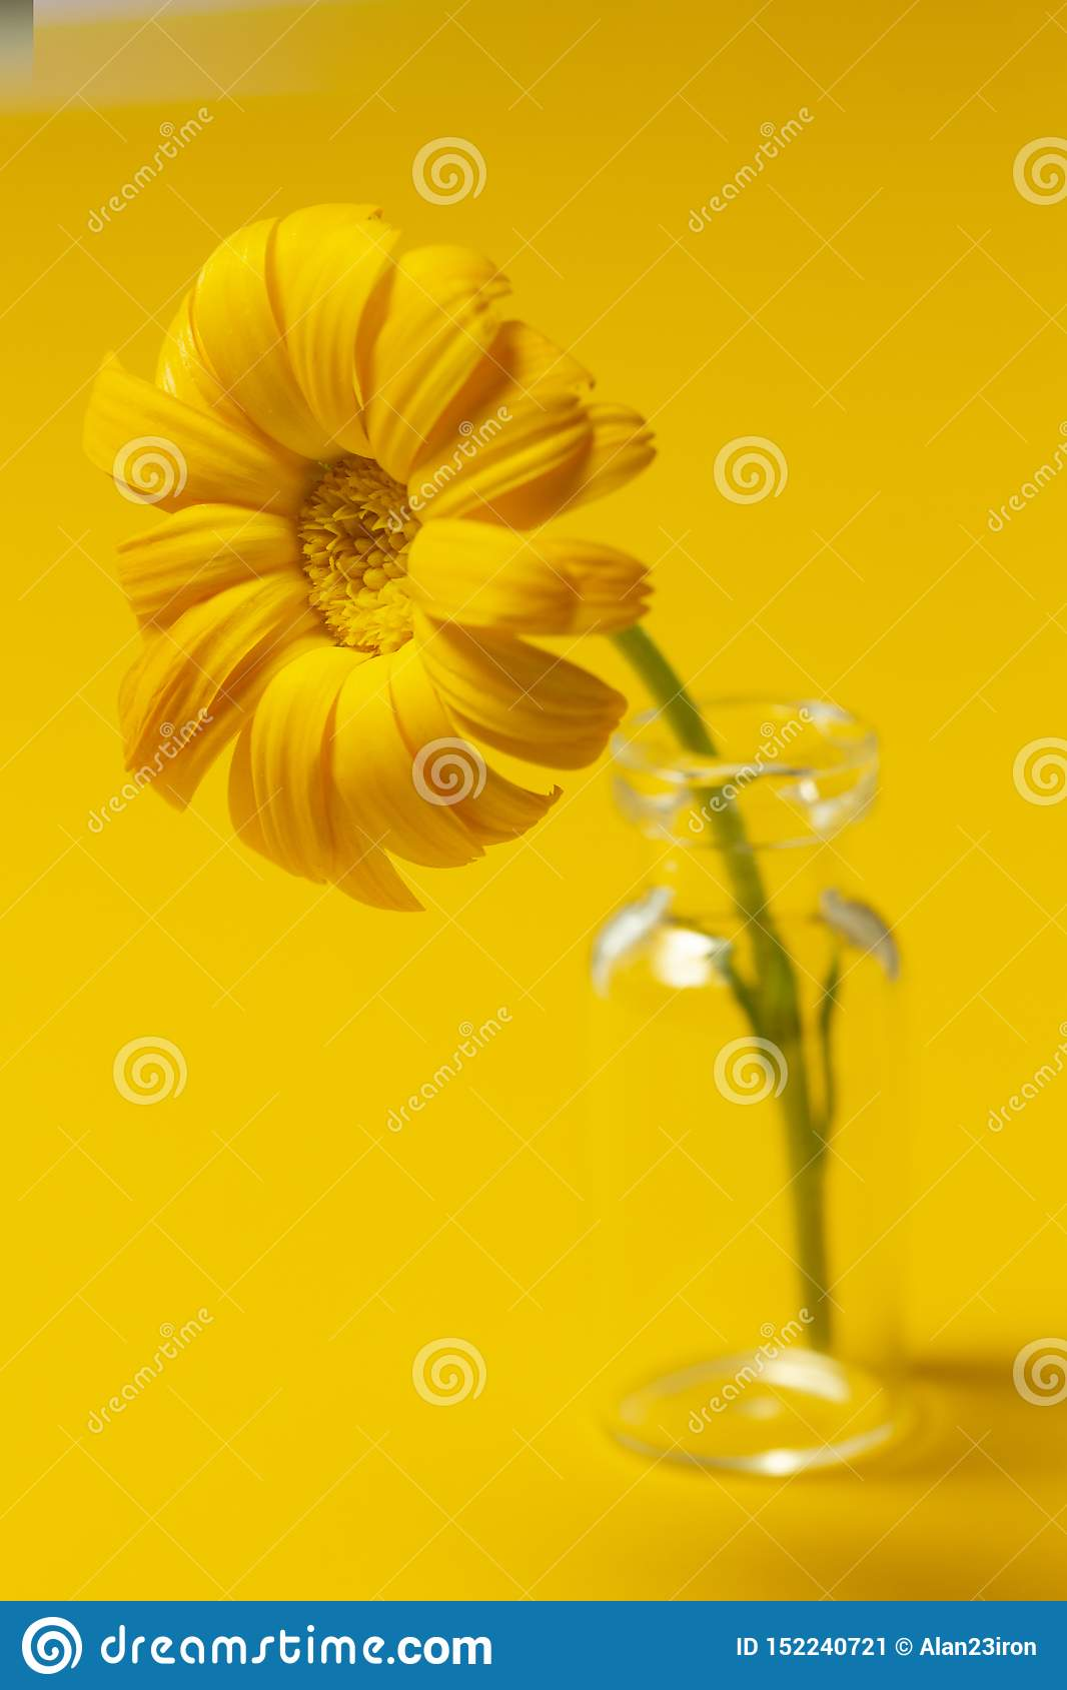 Beautiful calendula flower in glass jar on an yellow background . alternative medicine concept. minimalism style